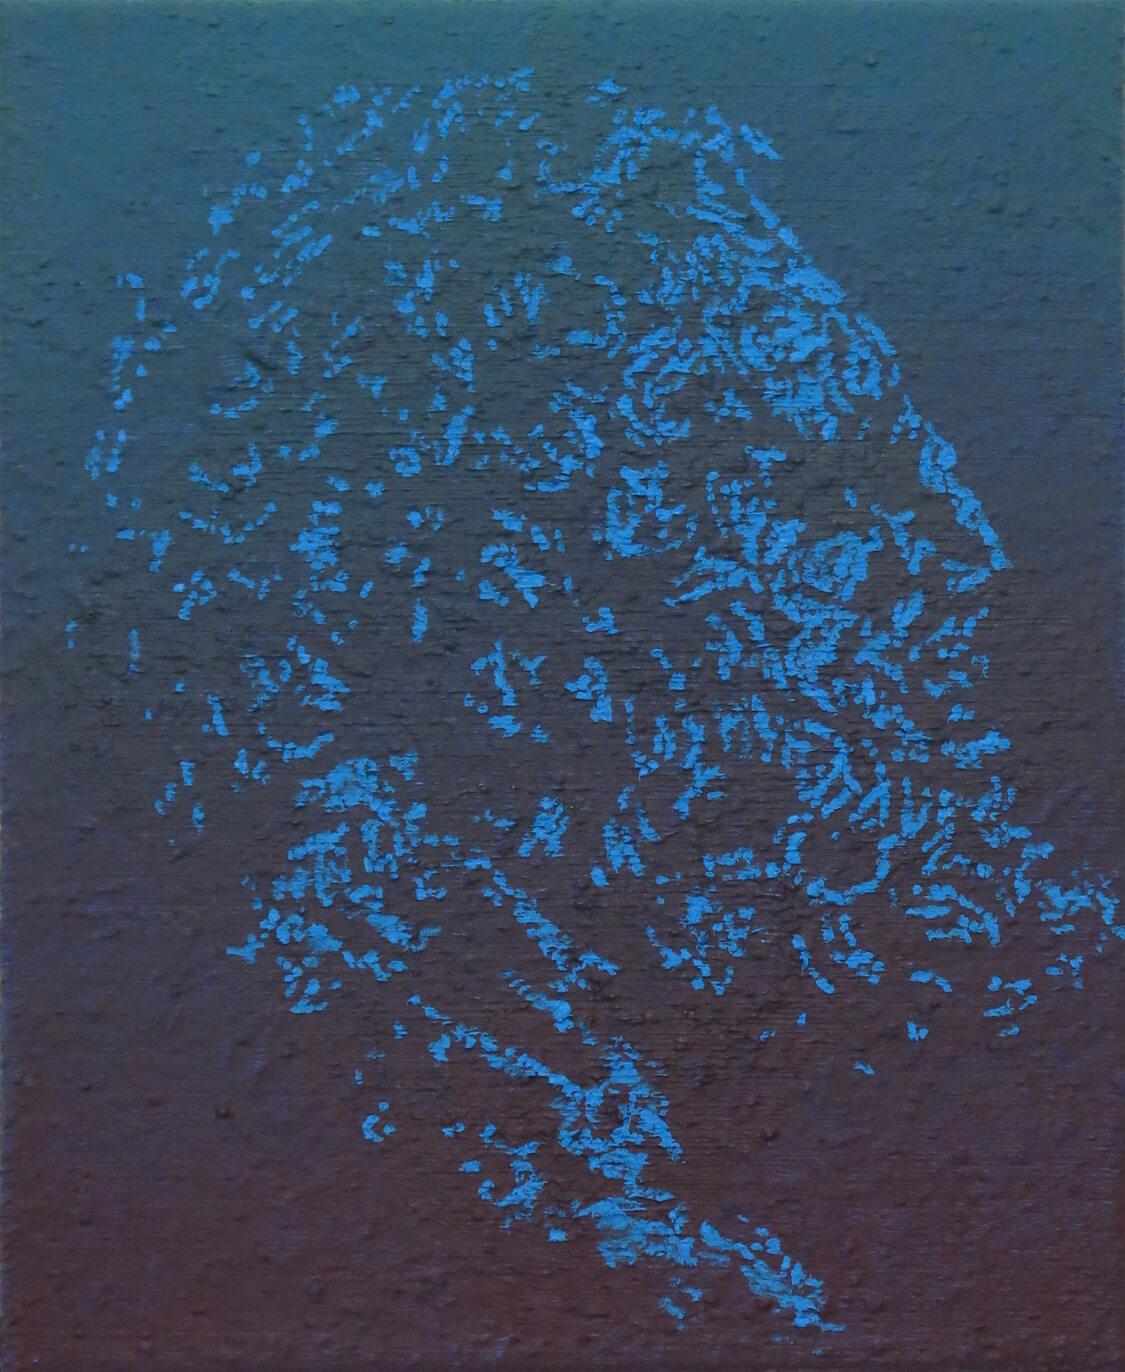 Head III - Oil on Canvas, 55 x 45 cm, 2016